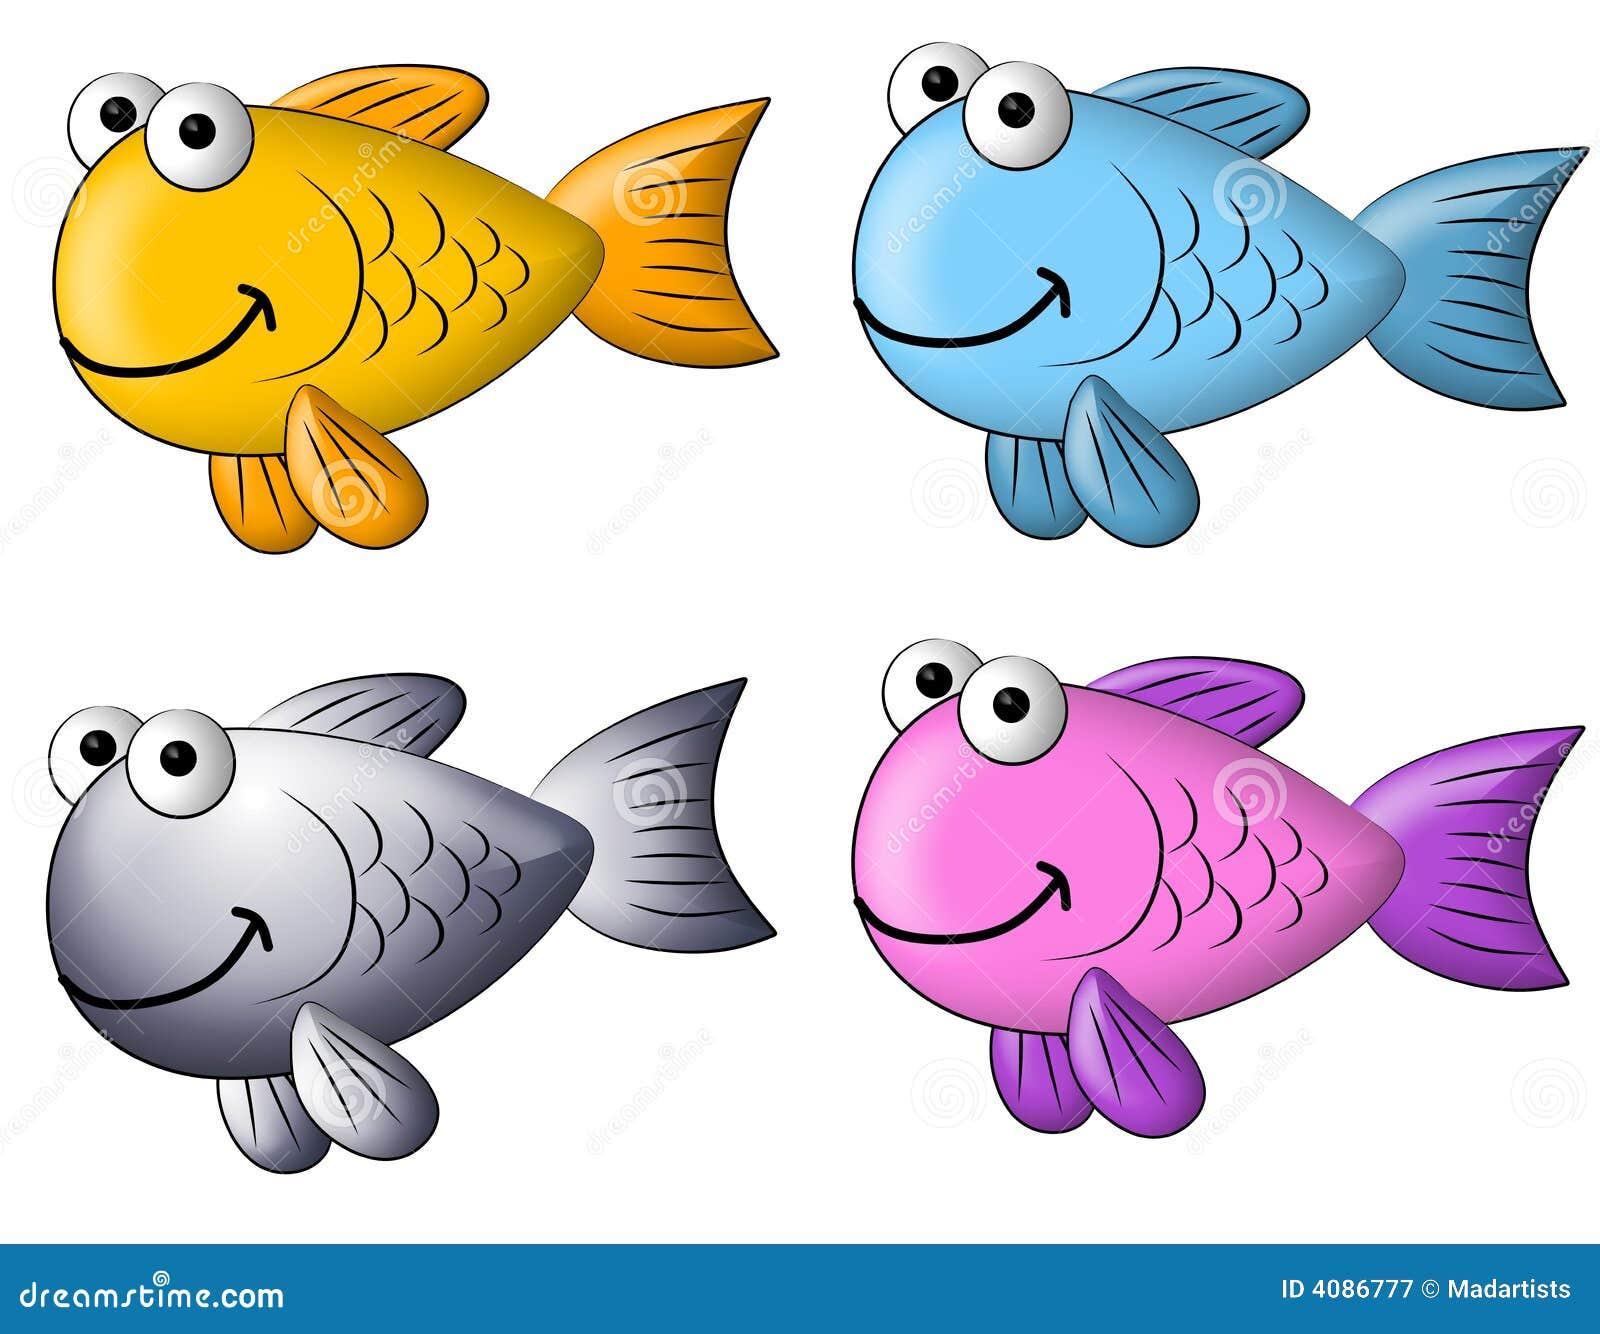 colourful cartoon fish clip art stock illustration illustration of rh dreamstime com free fish clipart images free fish clipart black and white